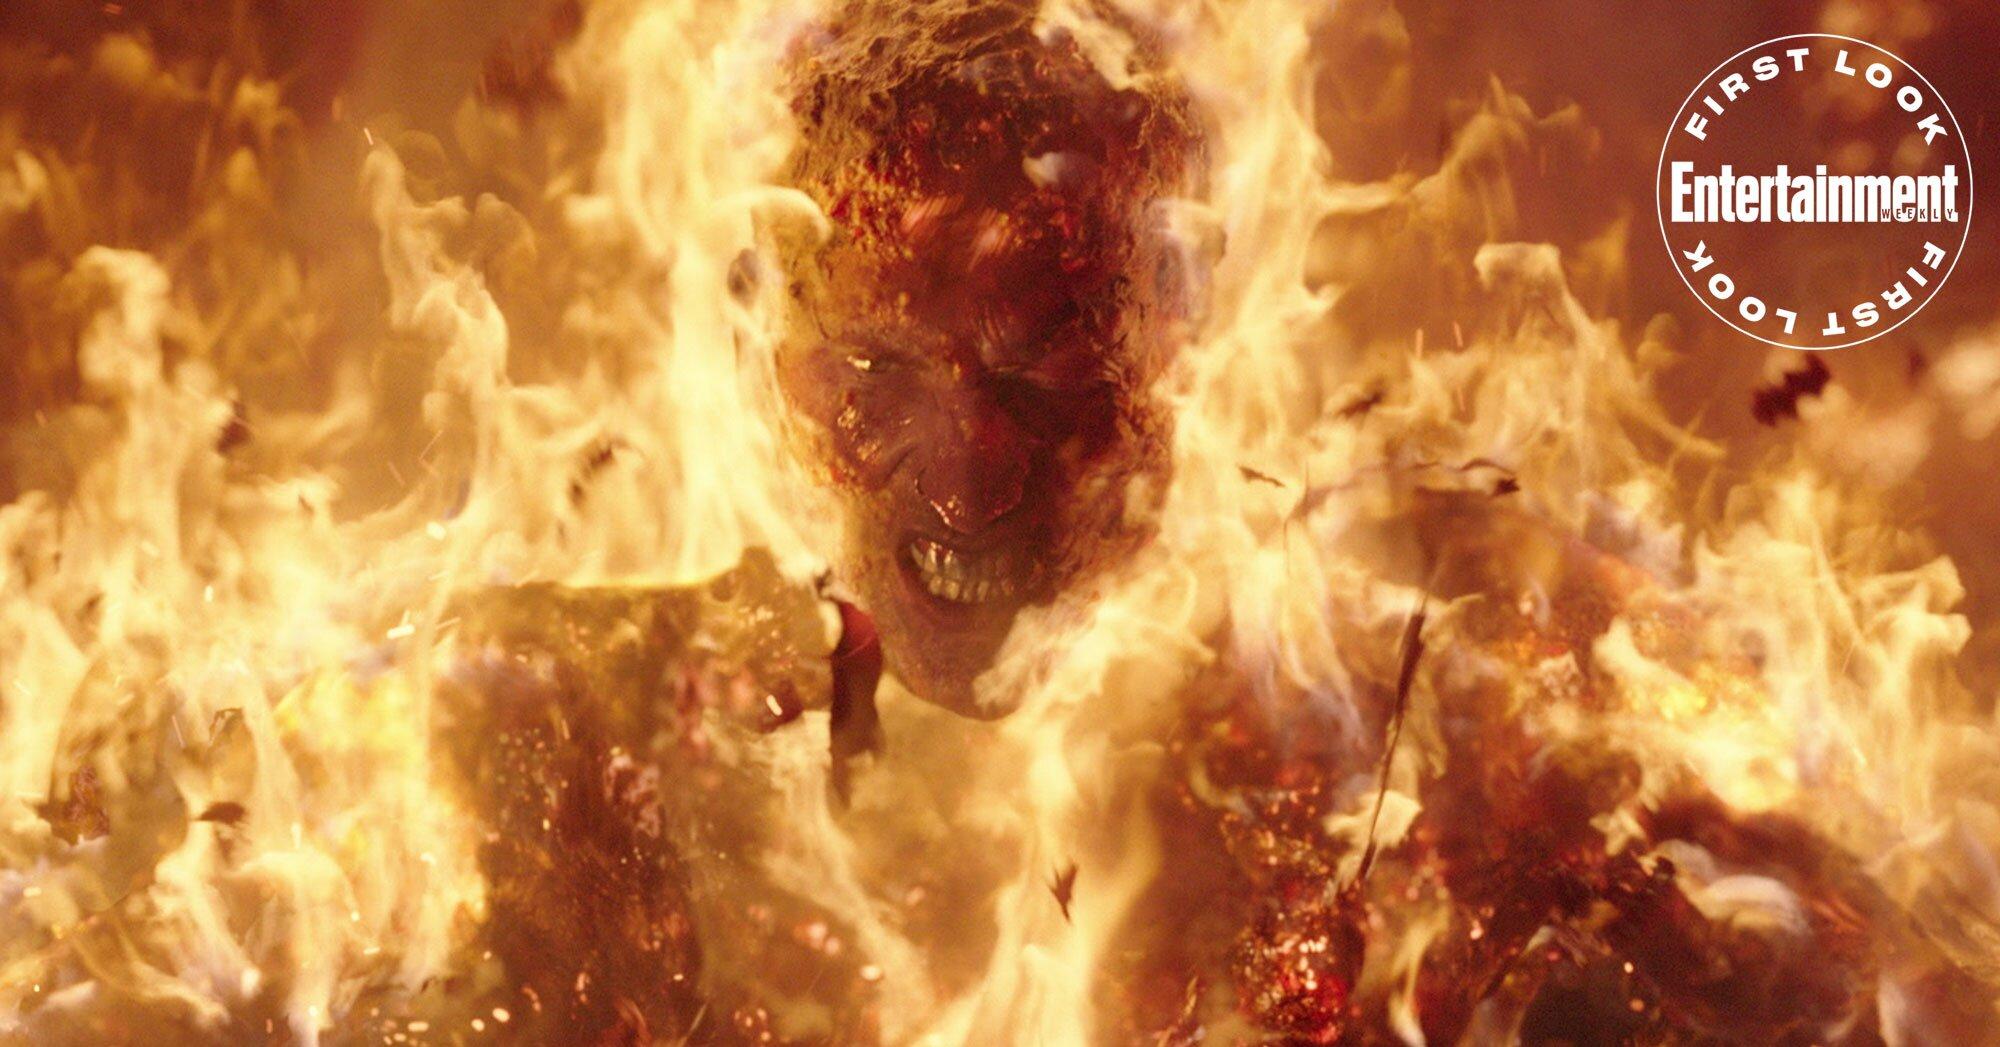 Get an electrifying first look at Jamie Foxx's Netflix thriller, Project Power